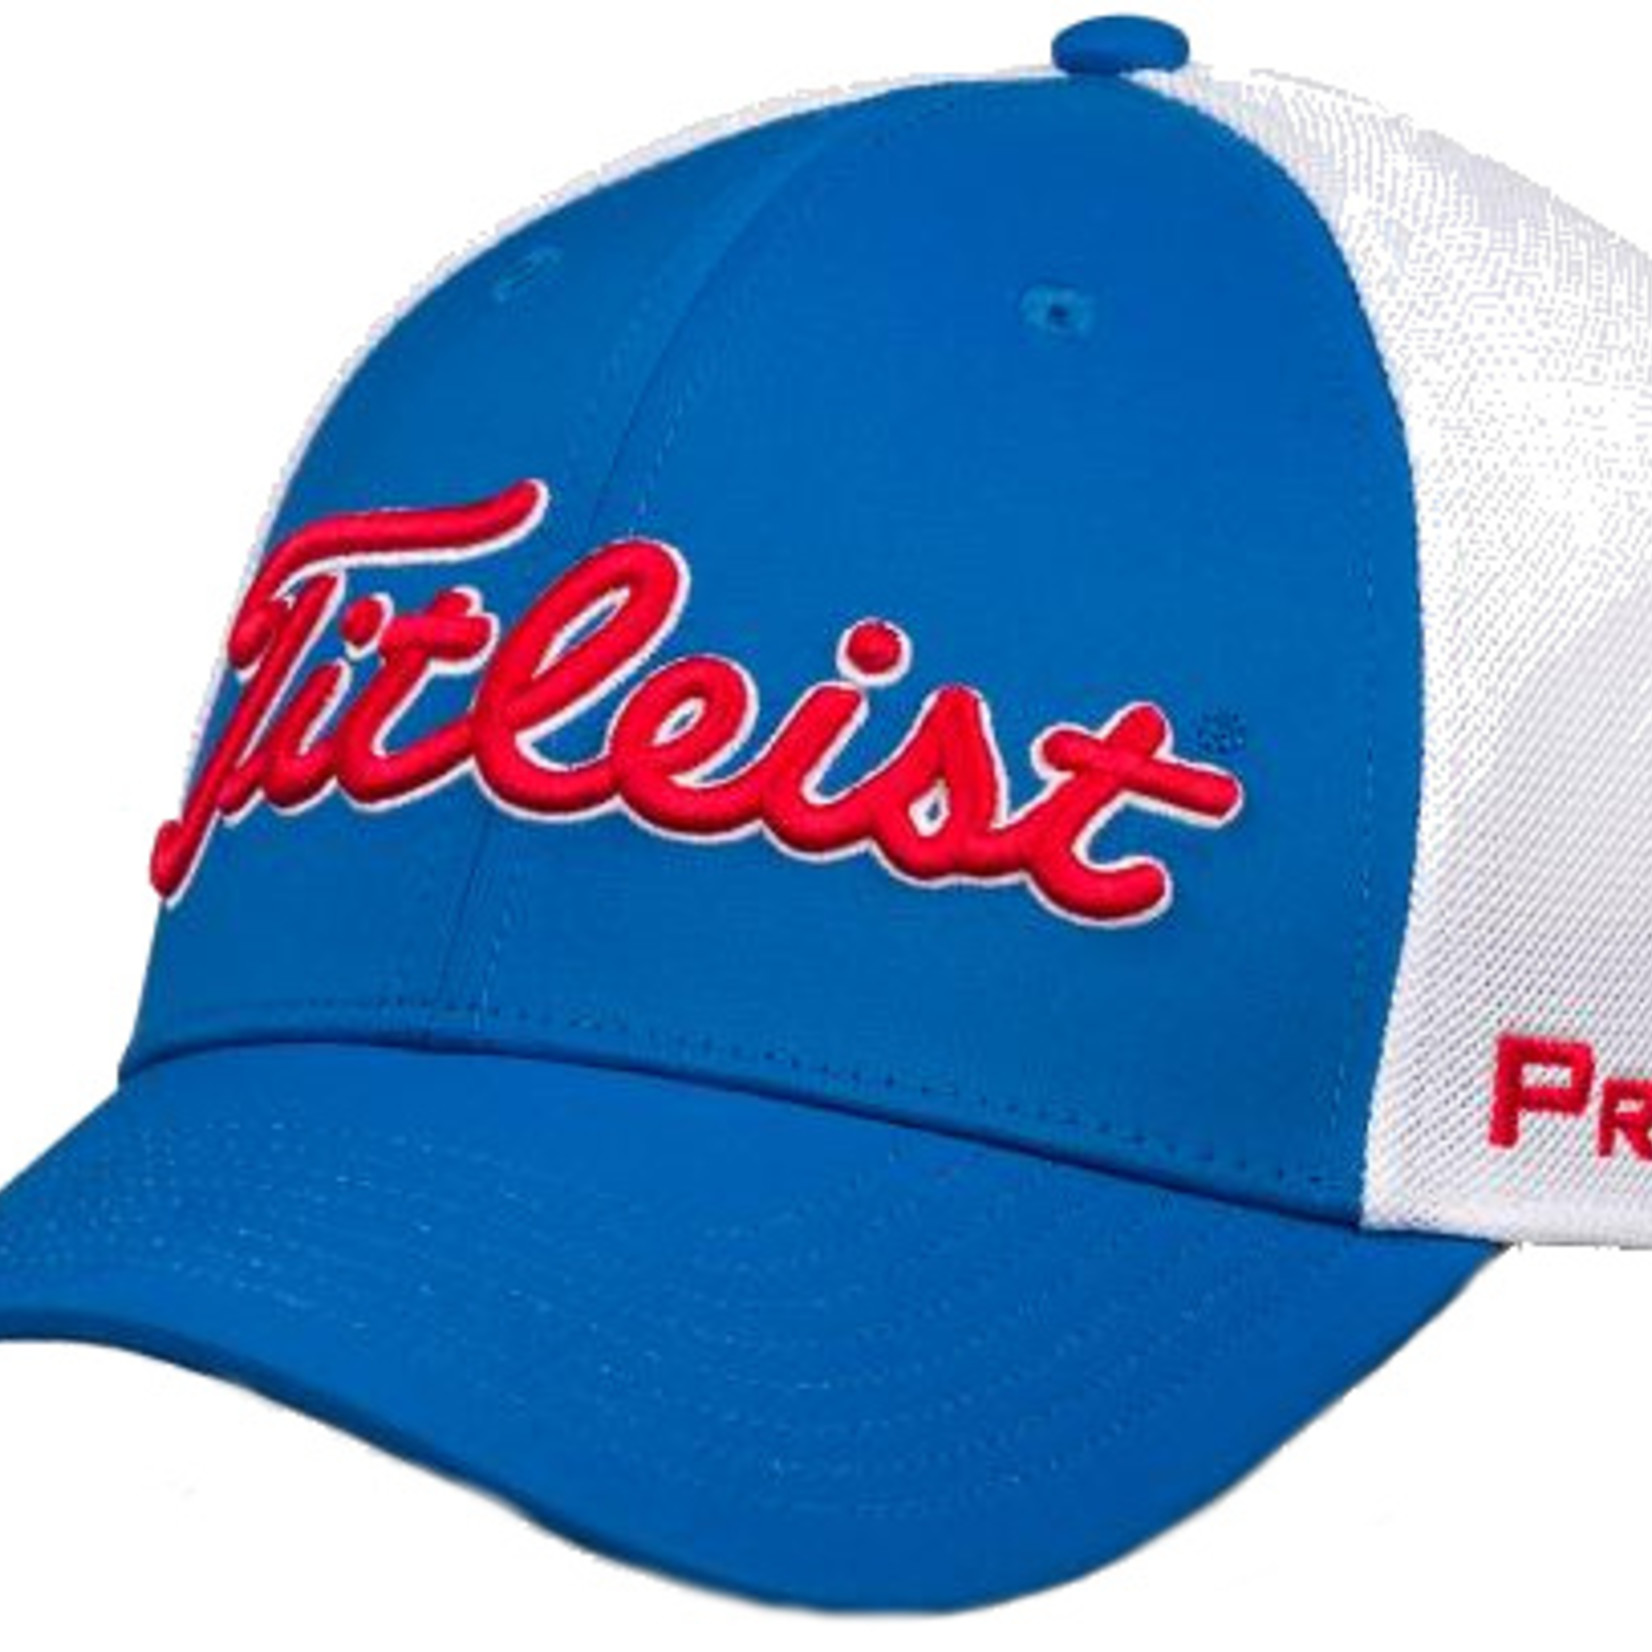 Titleist Titleist Men's Sports Tour Mesh Hat